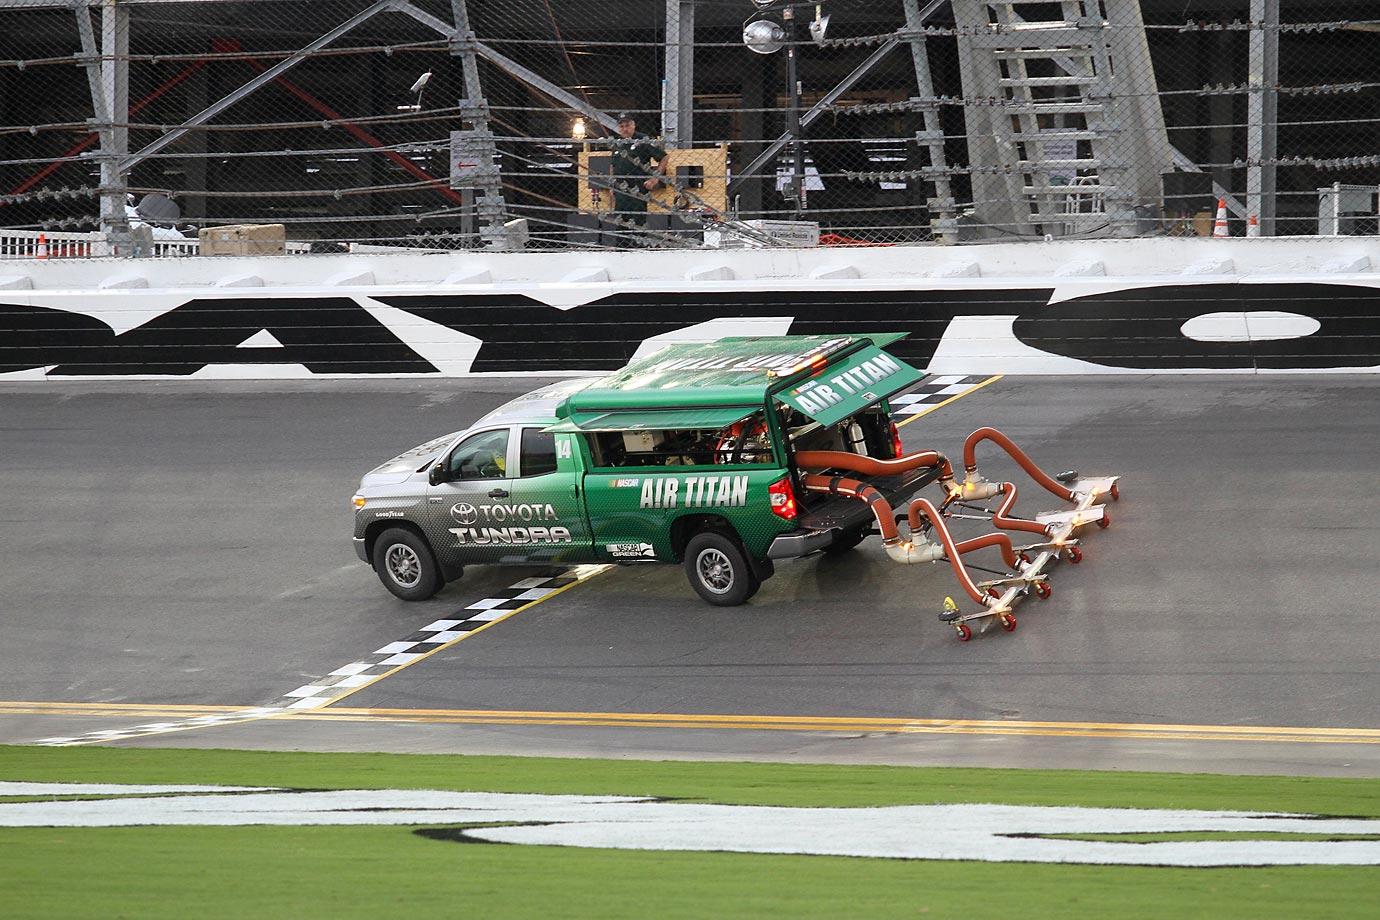 The Air Titan truck dries the track before the Xfinity Series Subway Firecracker 250 race in Daytona.